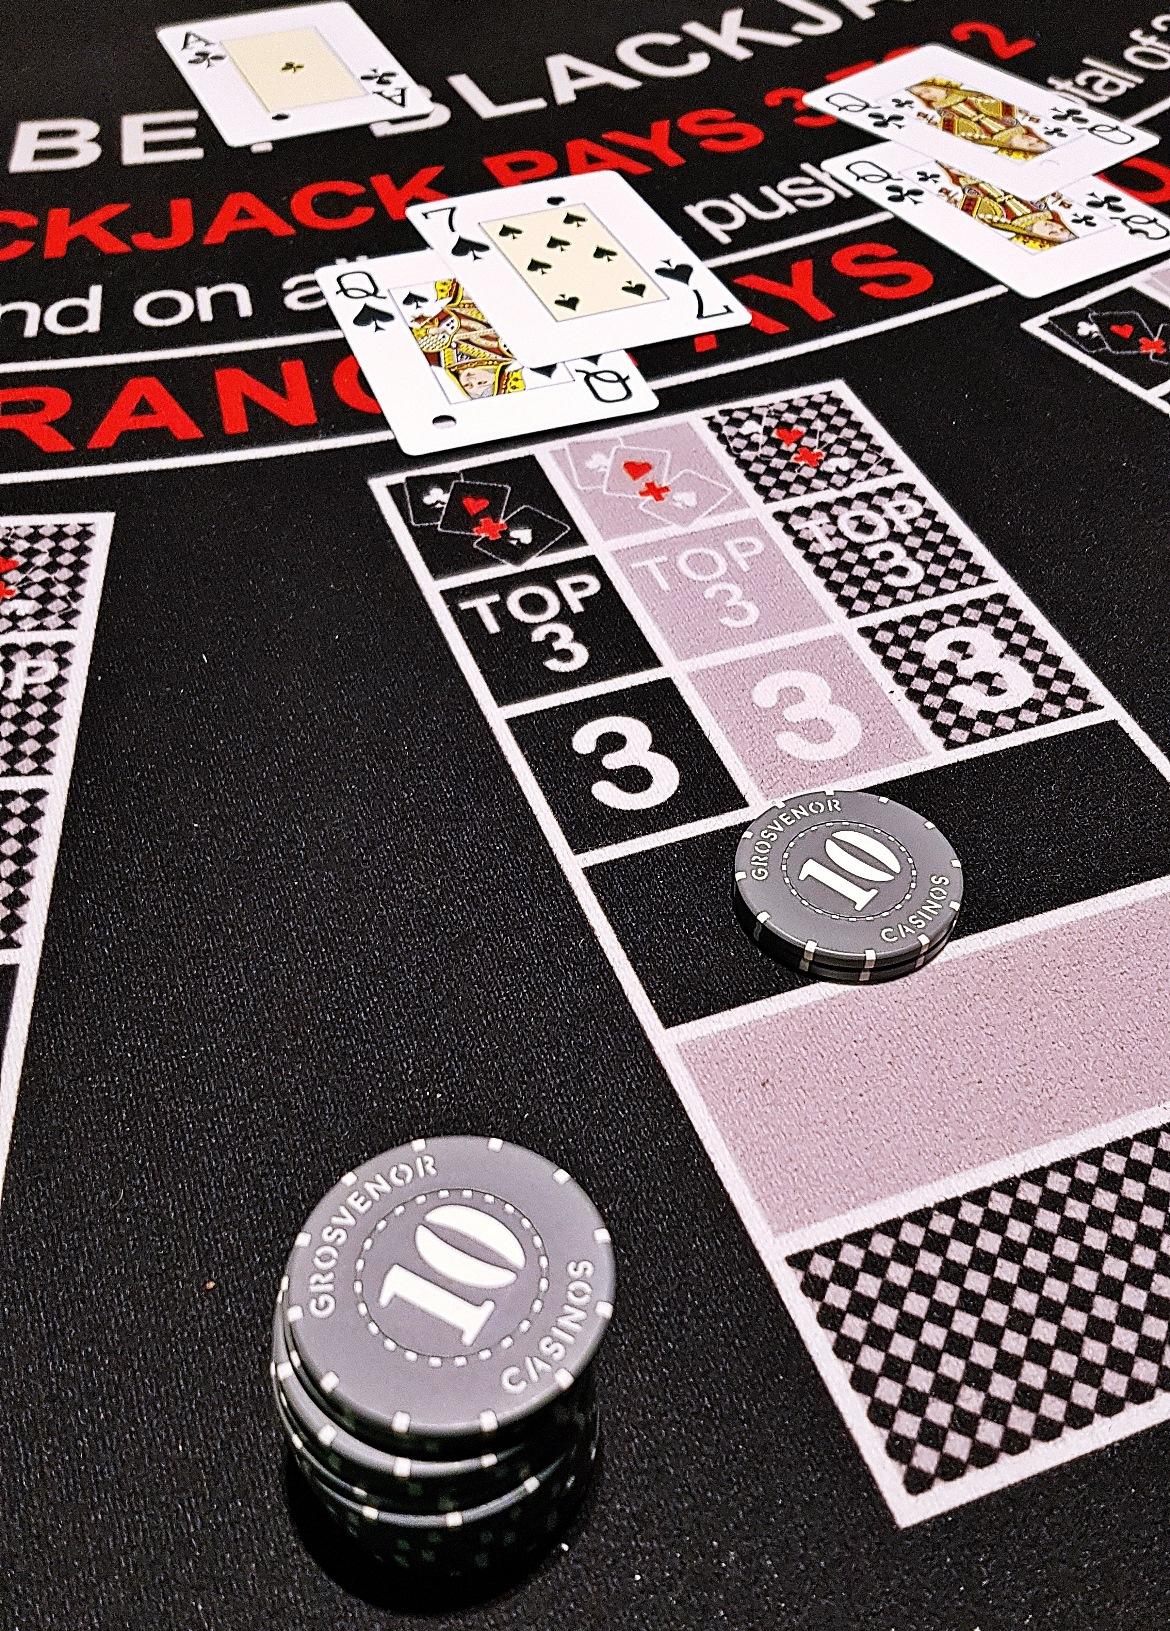 Early hands of blackjack - Grosvenor Casino Leeds review by BeckyBecky Blogs